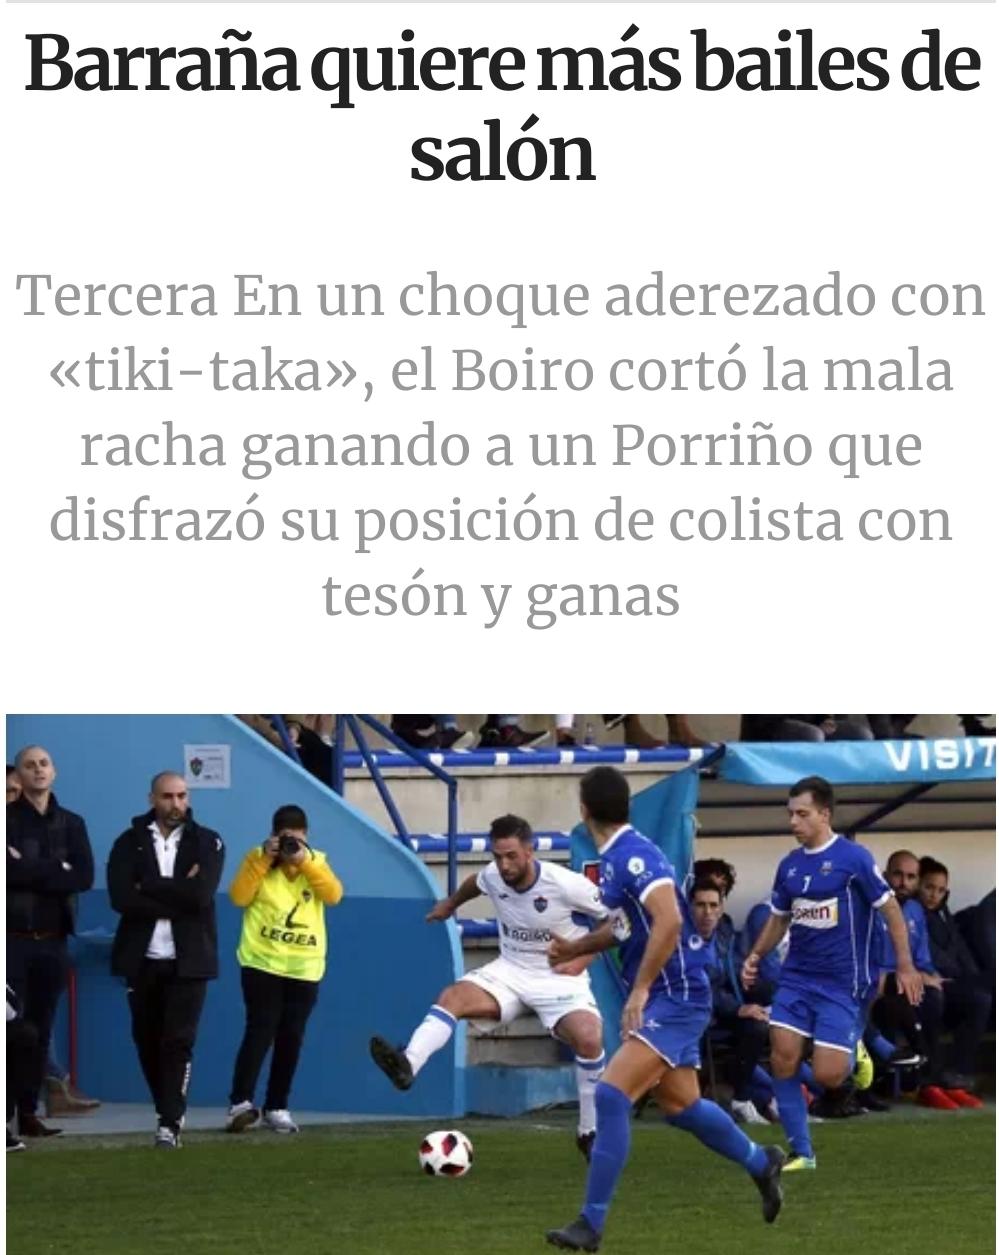 BARRAÑA QUIERE MÁS BAILES DE SALÓN